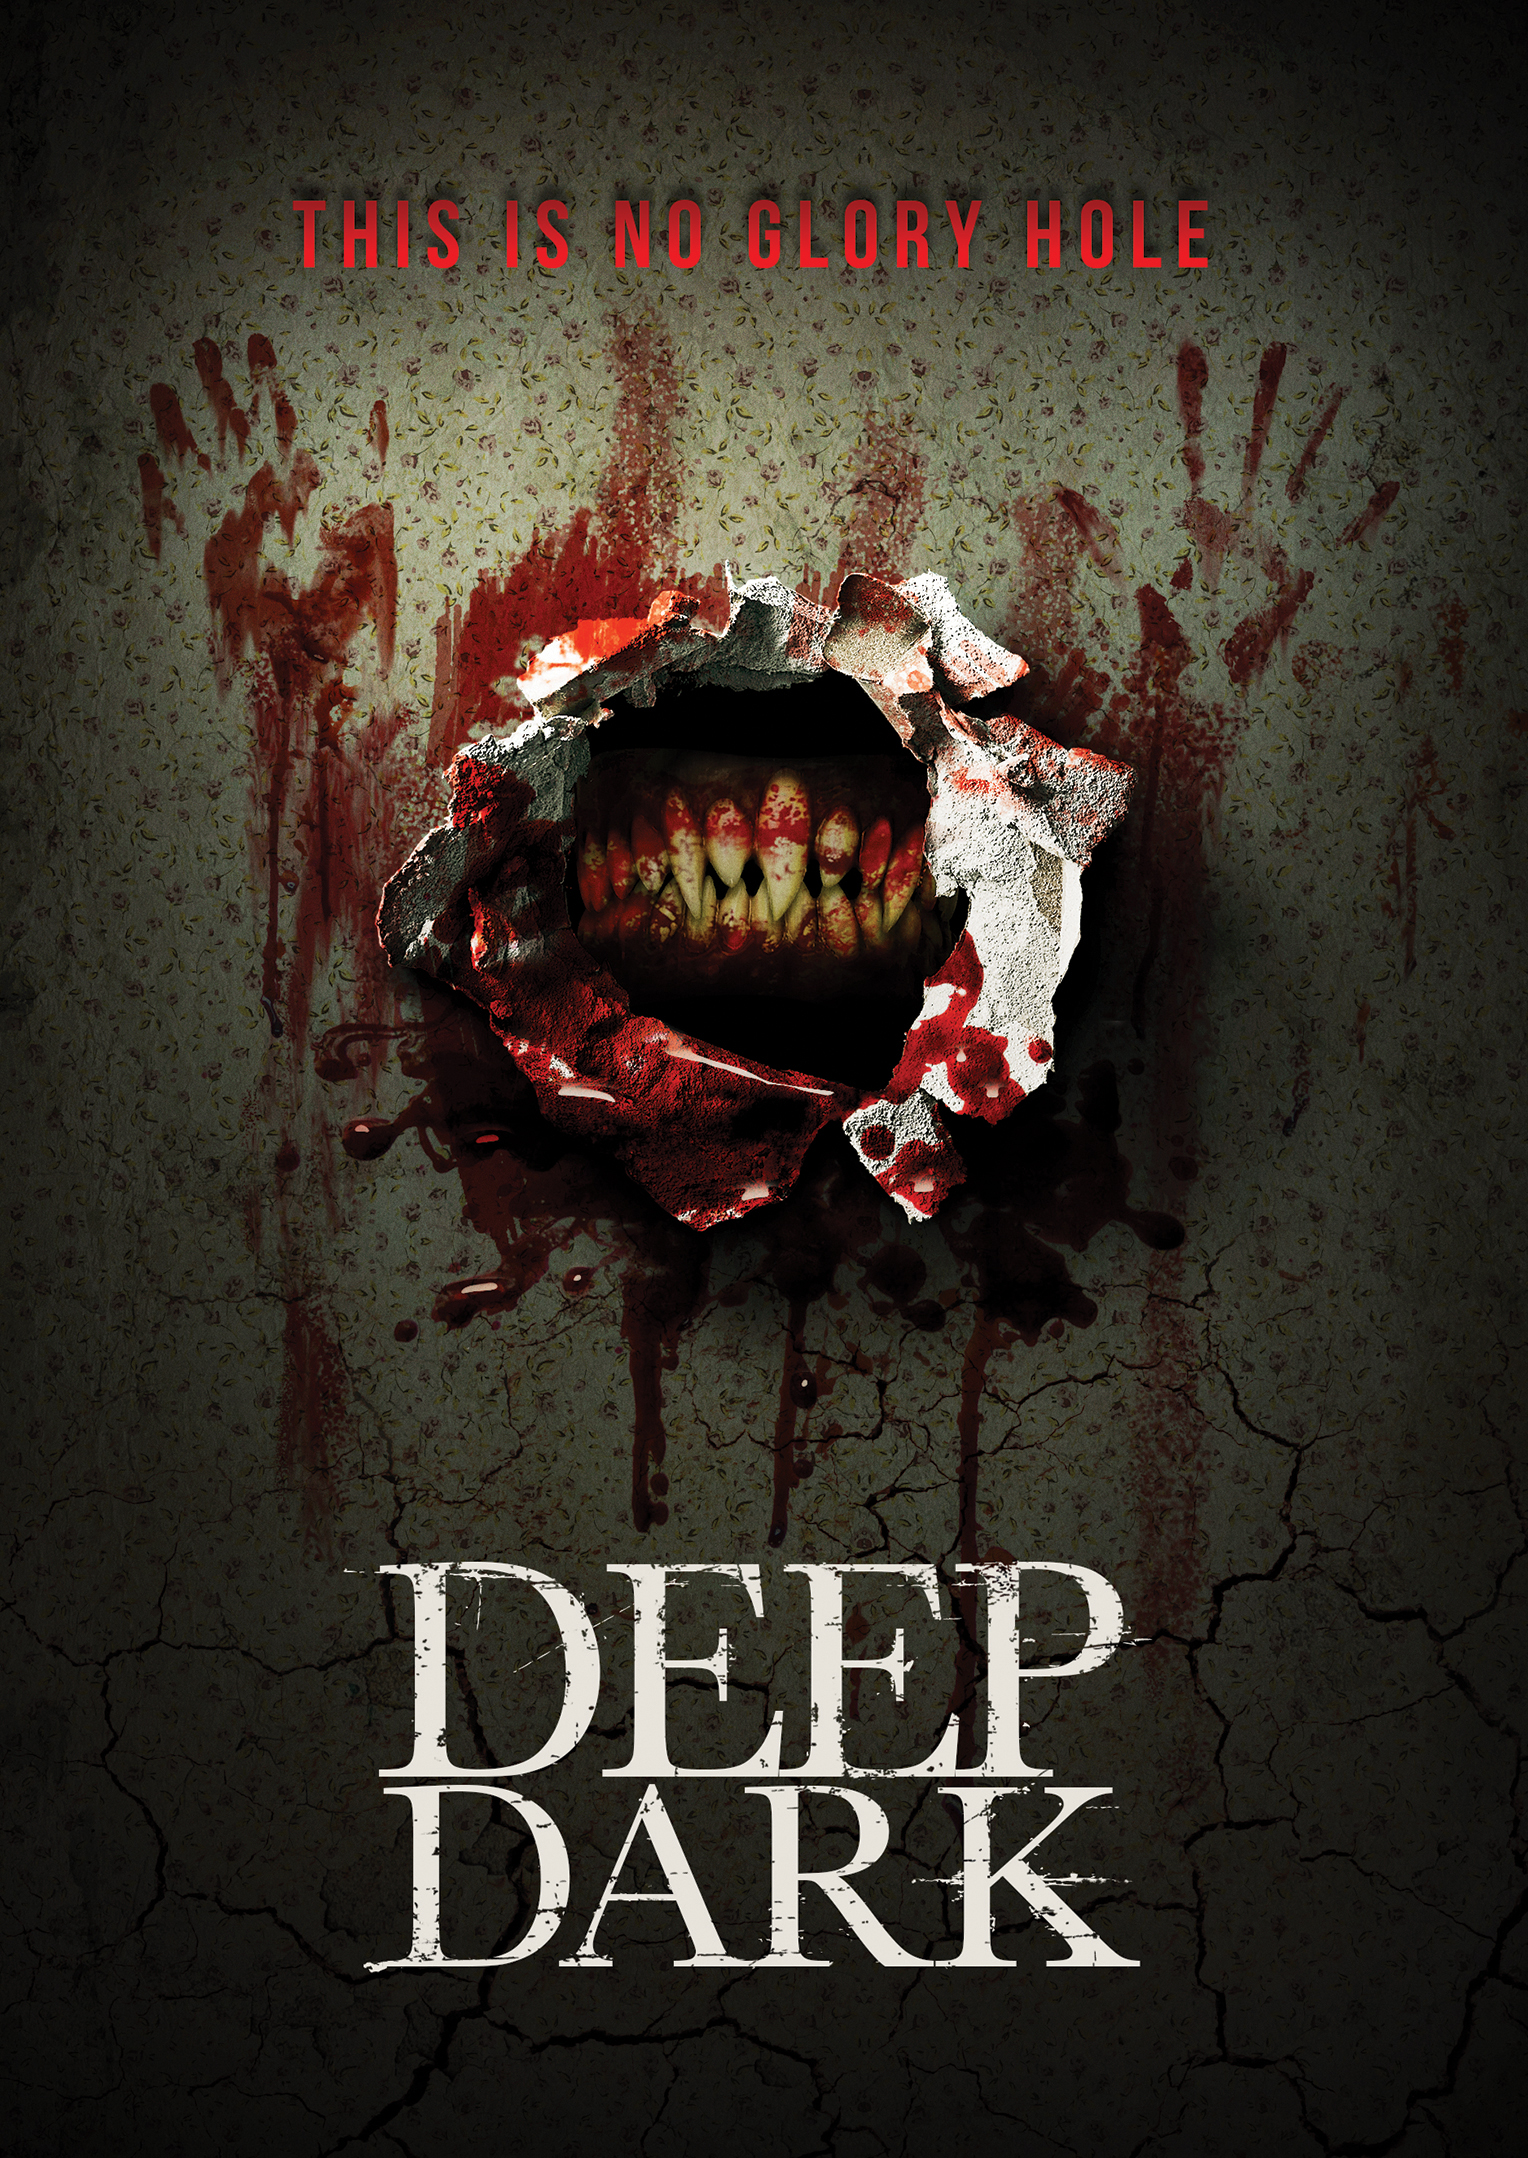 Deep_Dark_Art with Tagline